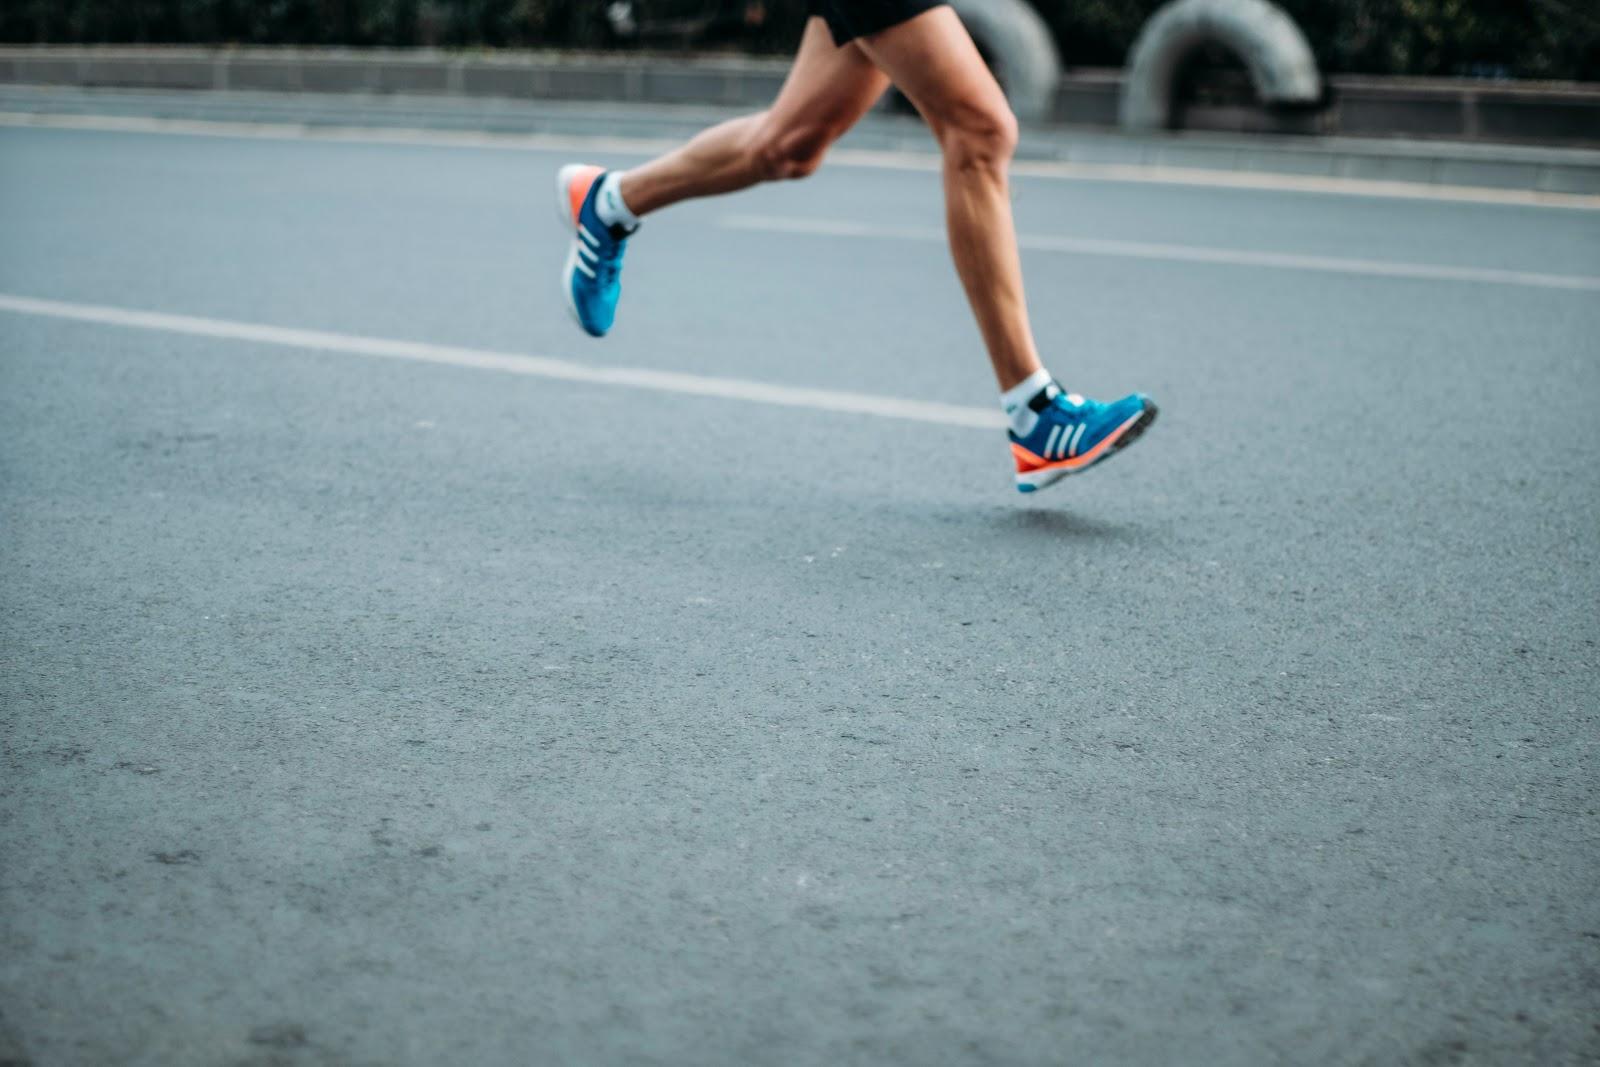 jogging image (swimming vs running)